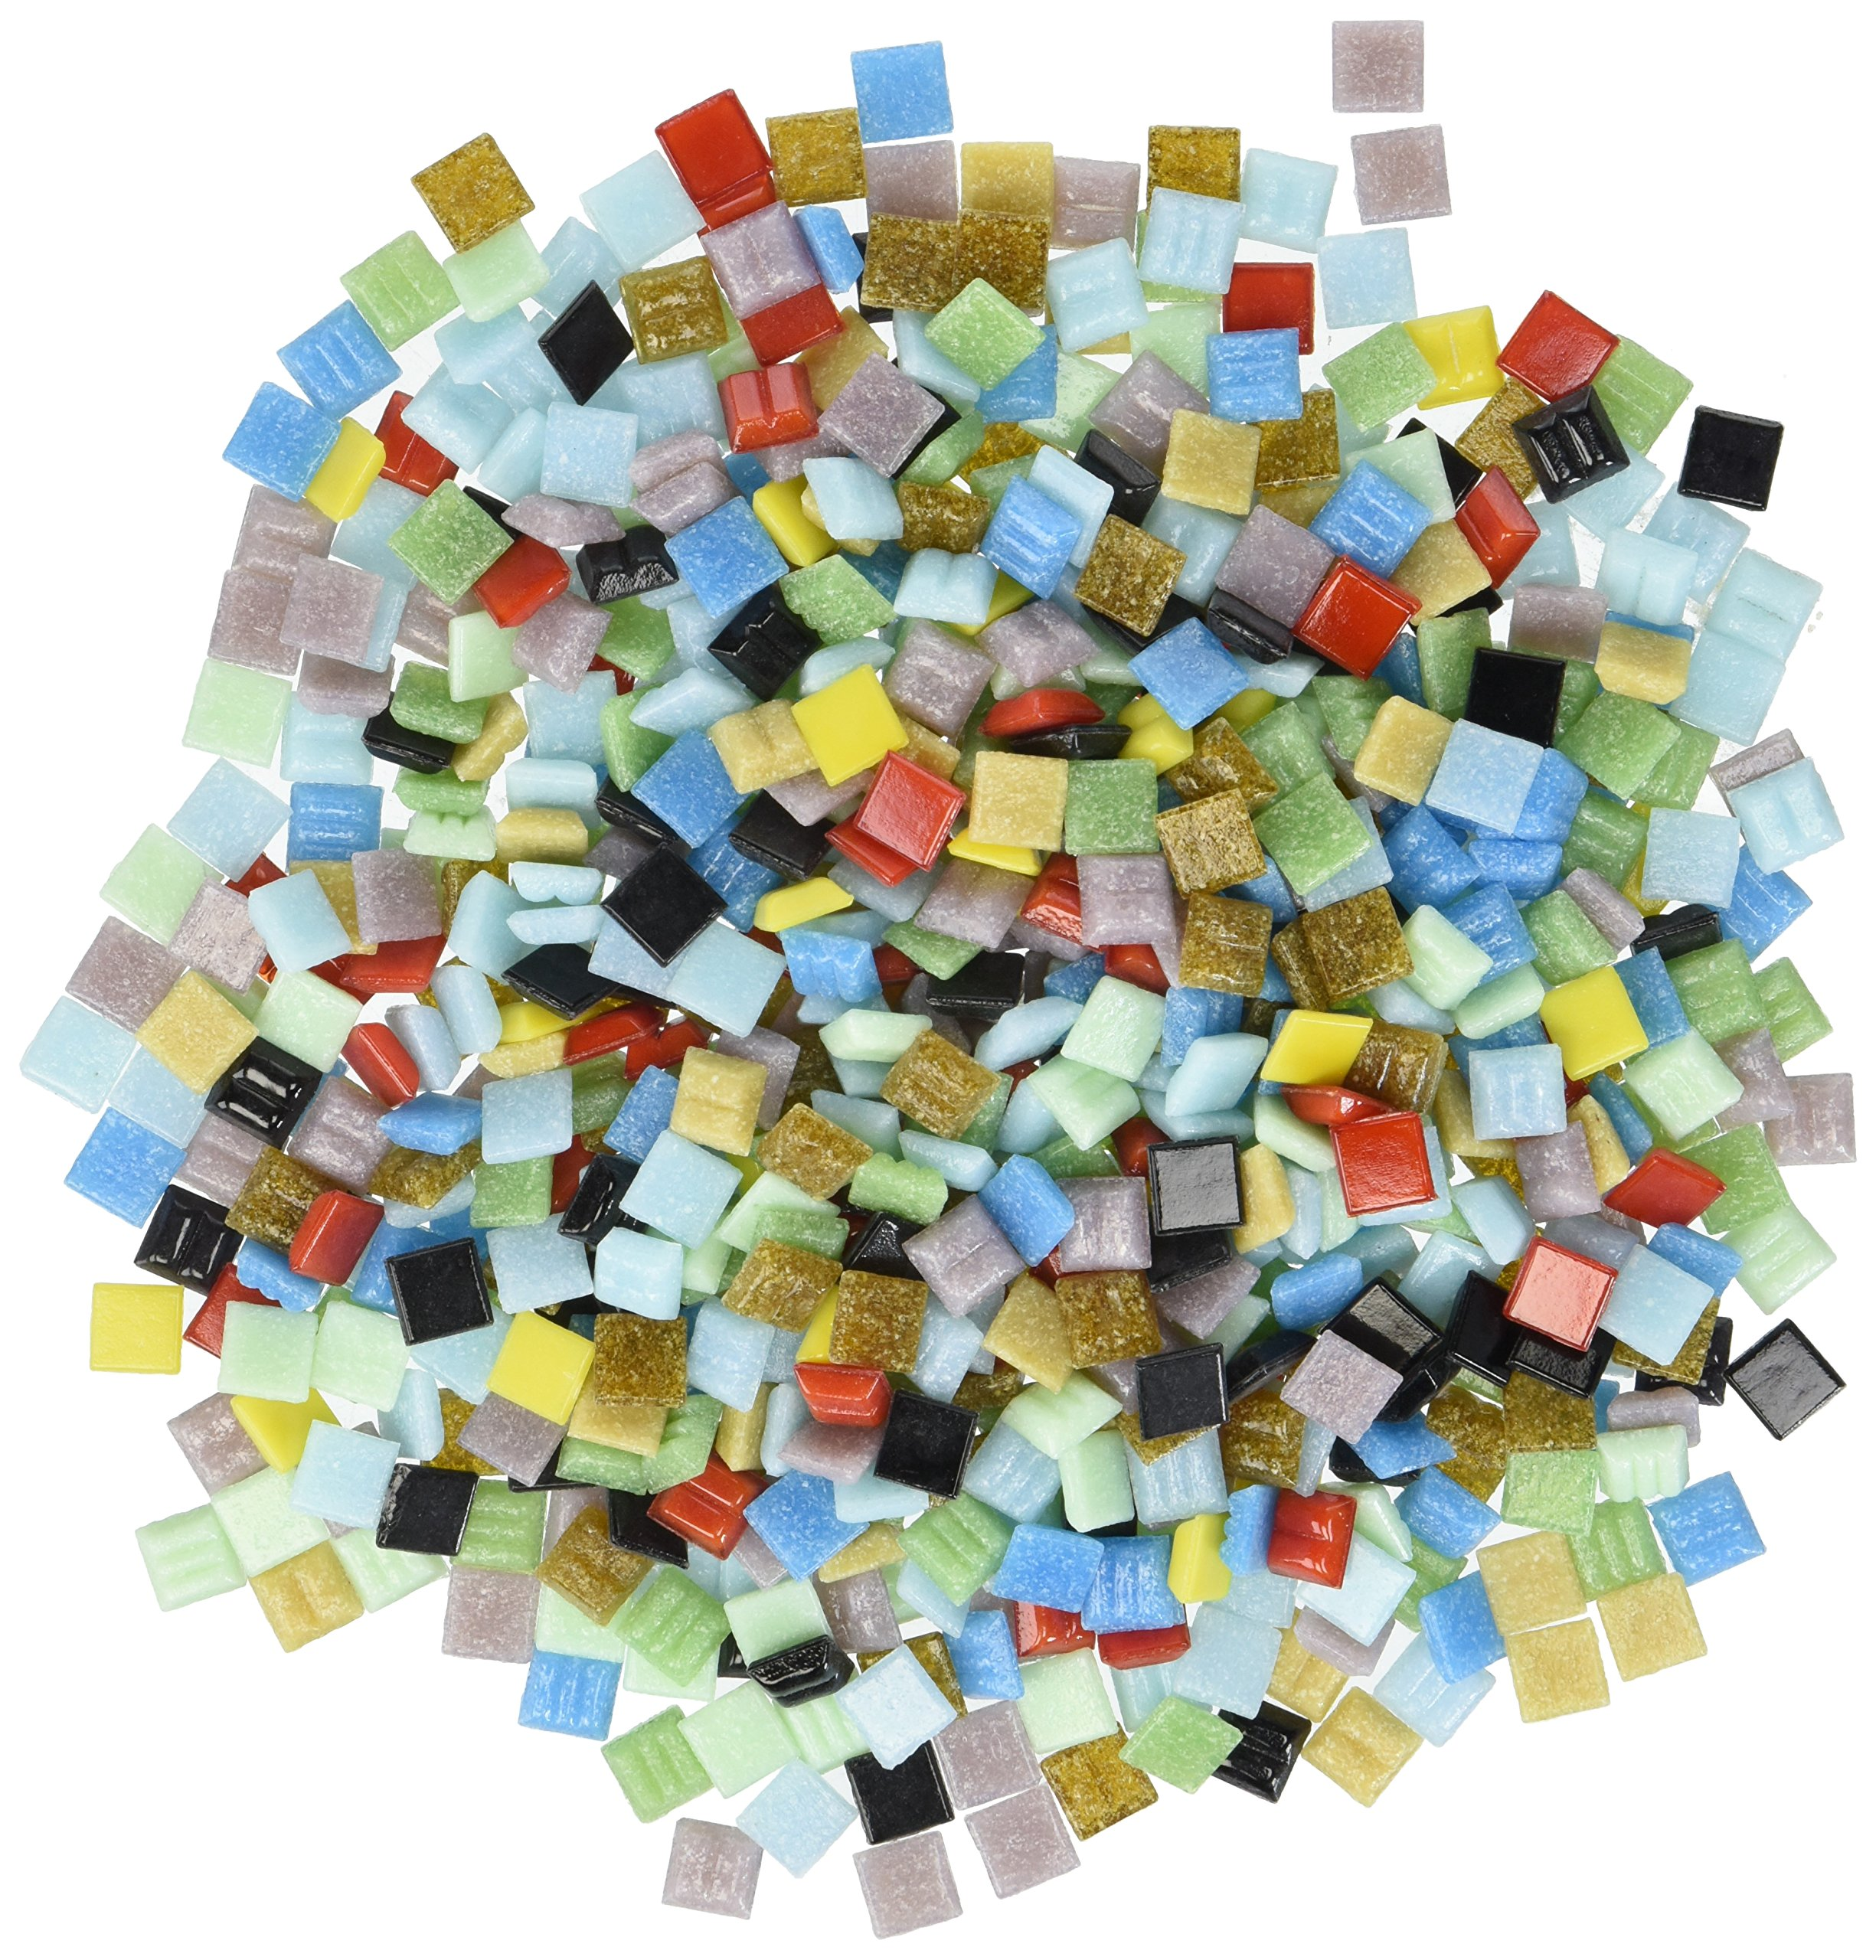 Mosaic Mercantile Vitreous Glass Mosaic Tiles - Assorted Colors - 3/8'' - 1 Pound Bag by Mosaic Mercantile